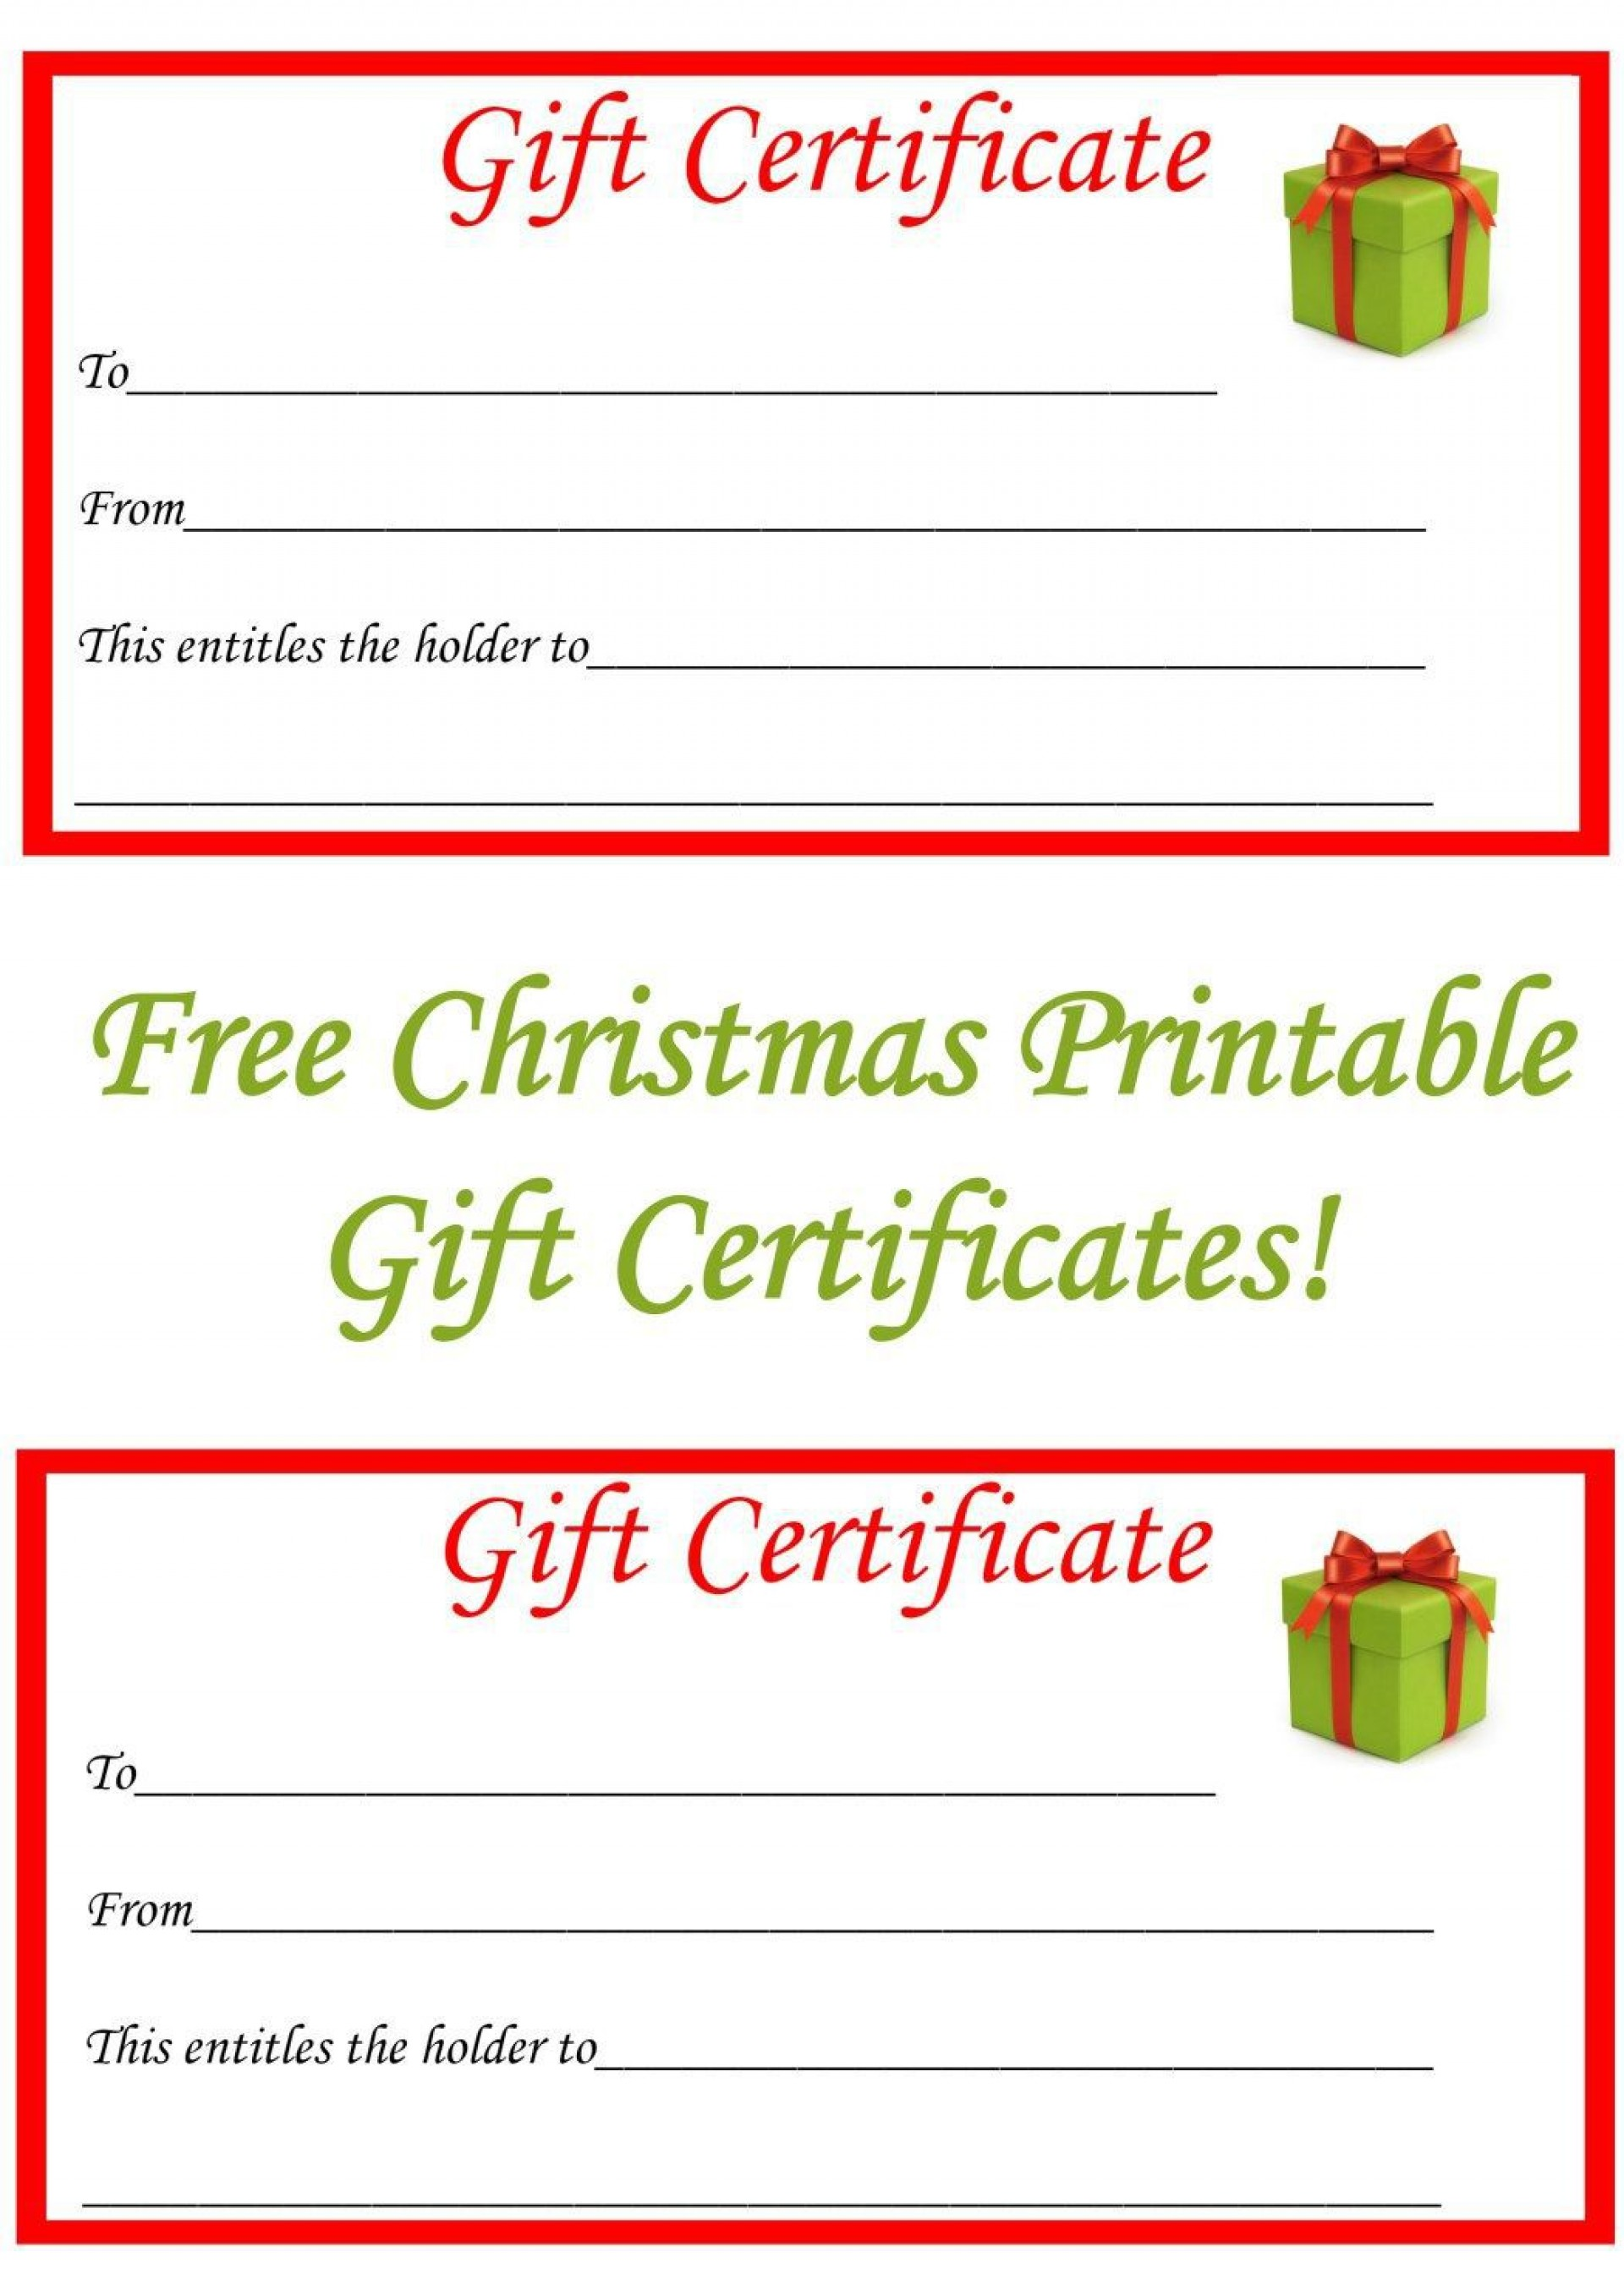 002 Surprising Blank Gift Certificate Template Sample  Free Printable Downloadable1920